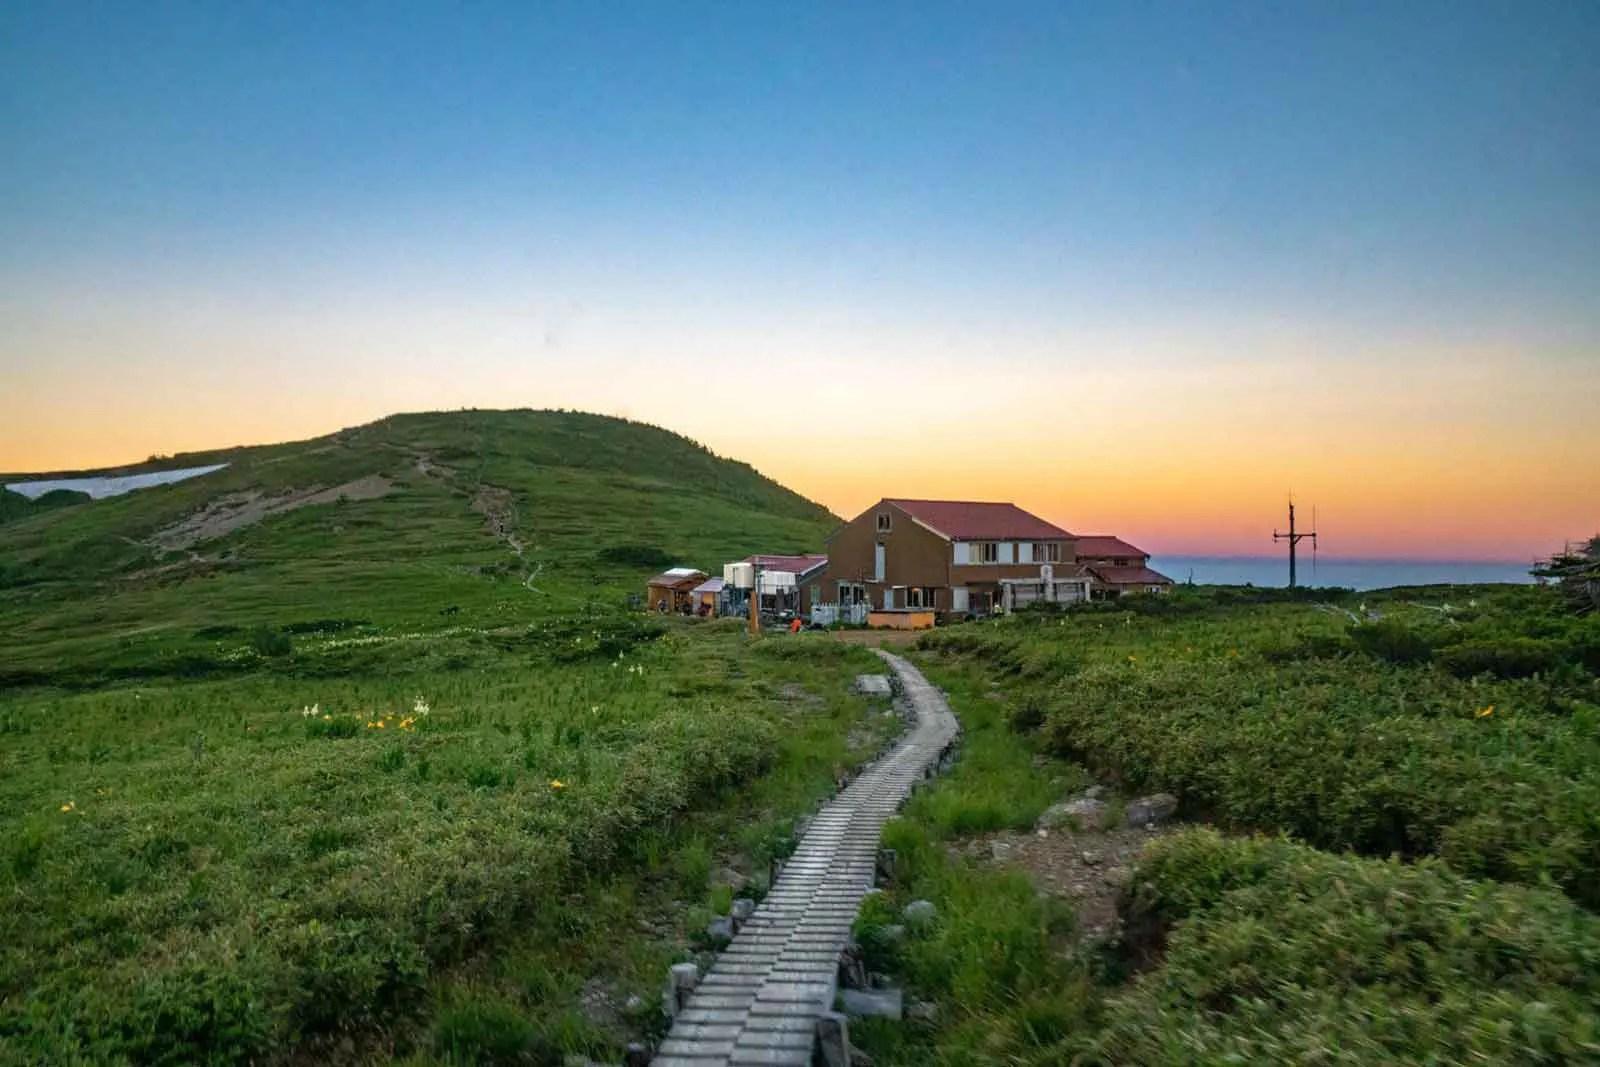 Japan Alps Traverse Kita Alps Sunrise Hut